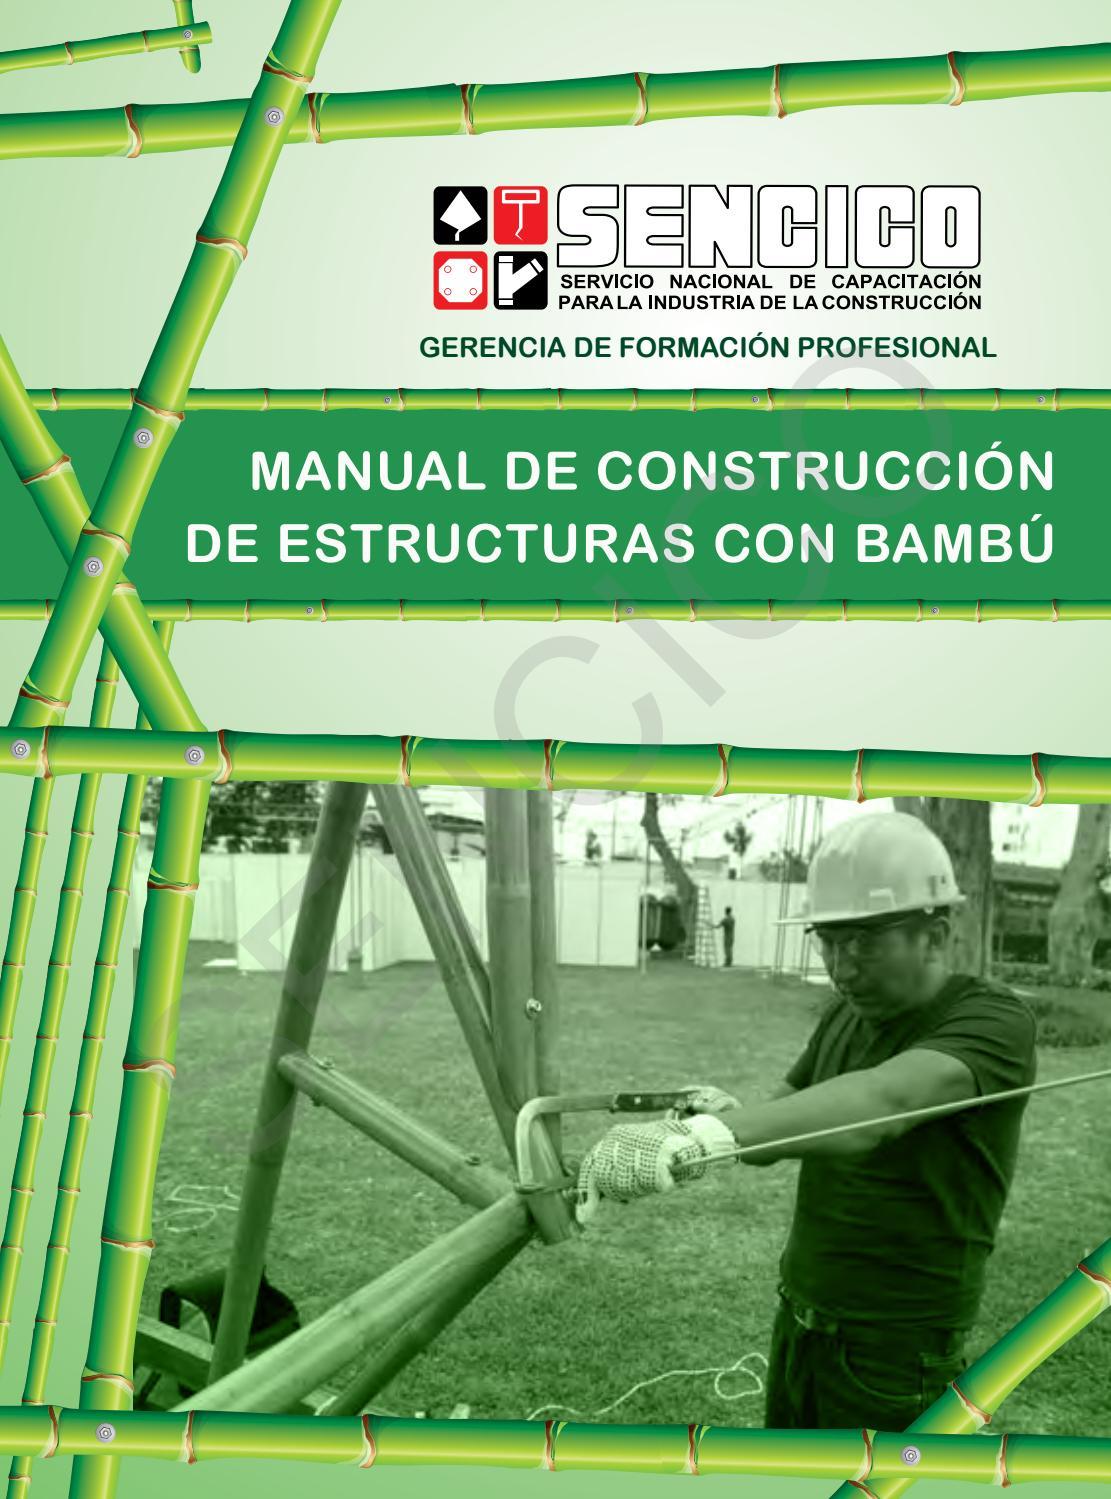 Manual de construcci n de estructuras de bamb by george - Reproduccion del bambu ...